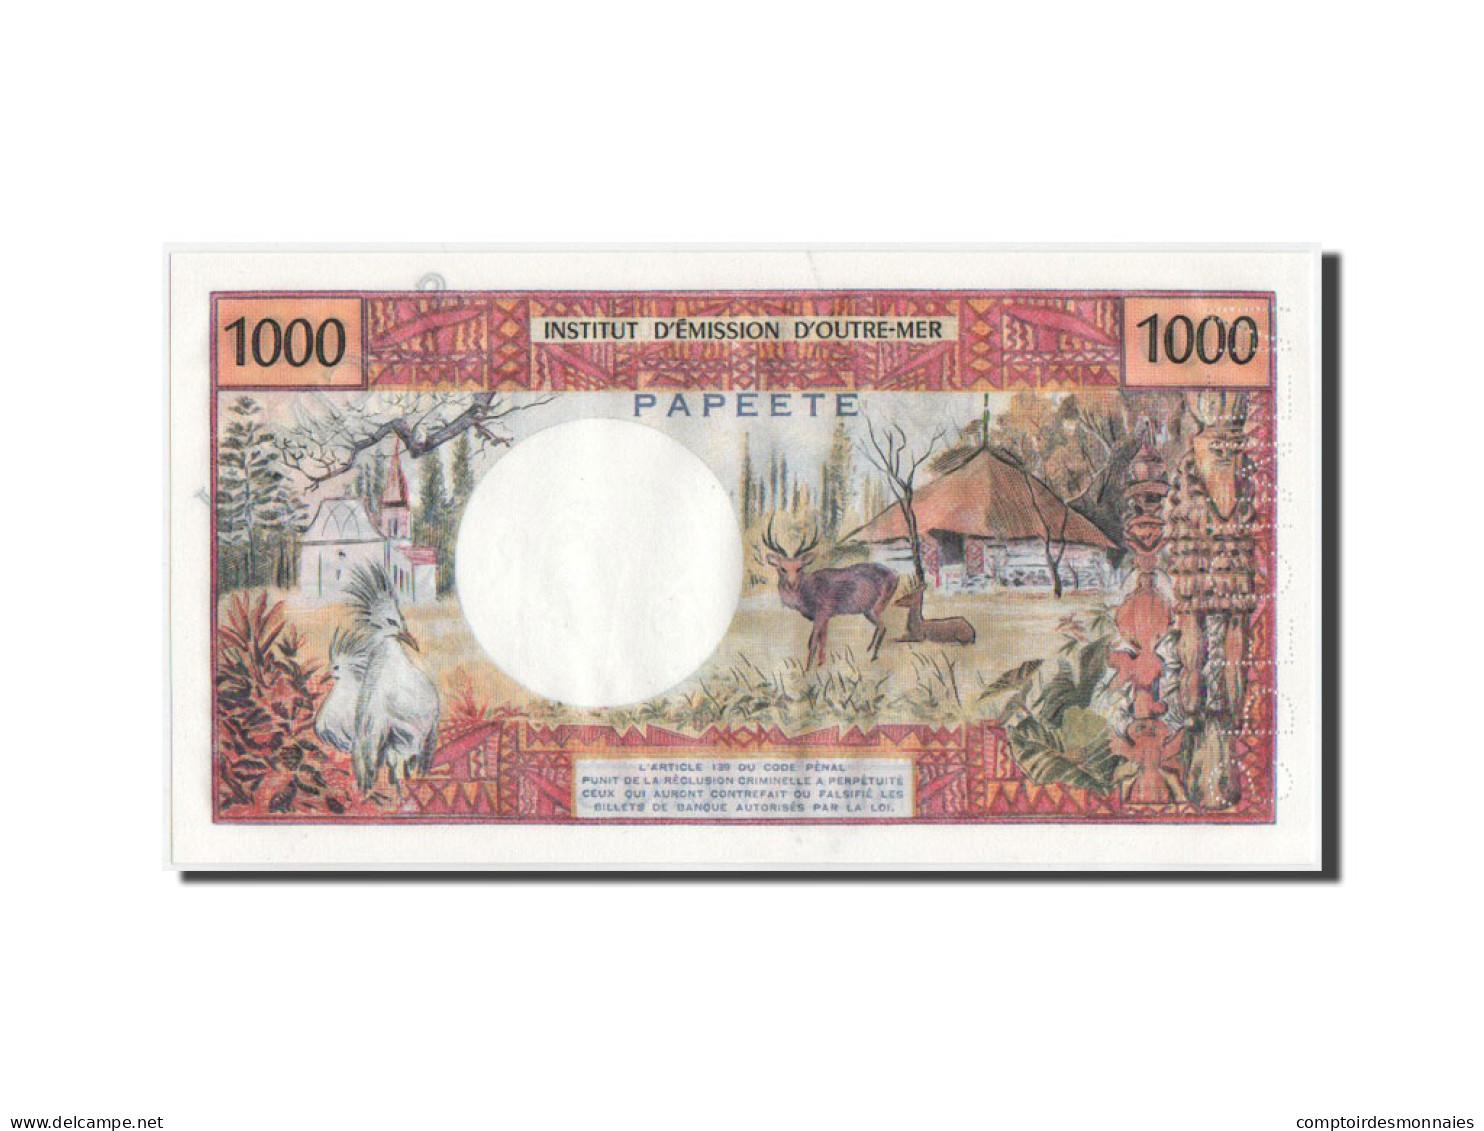 Tahiti, 1000 Francs, 1983, SPECIMEN, KM:27cs, NEUF - Papeete (French Polynesia 1914-1985)